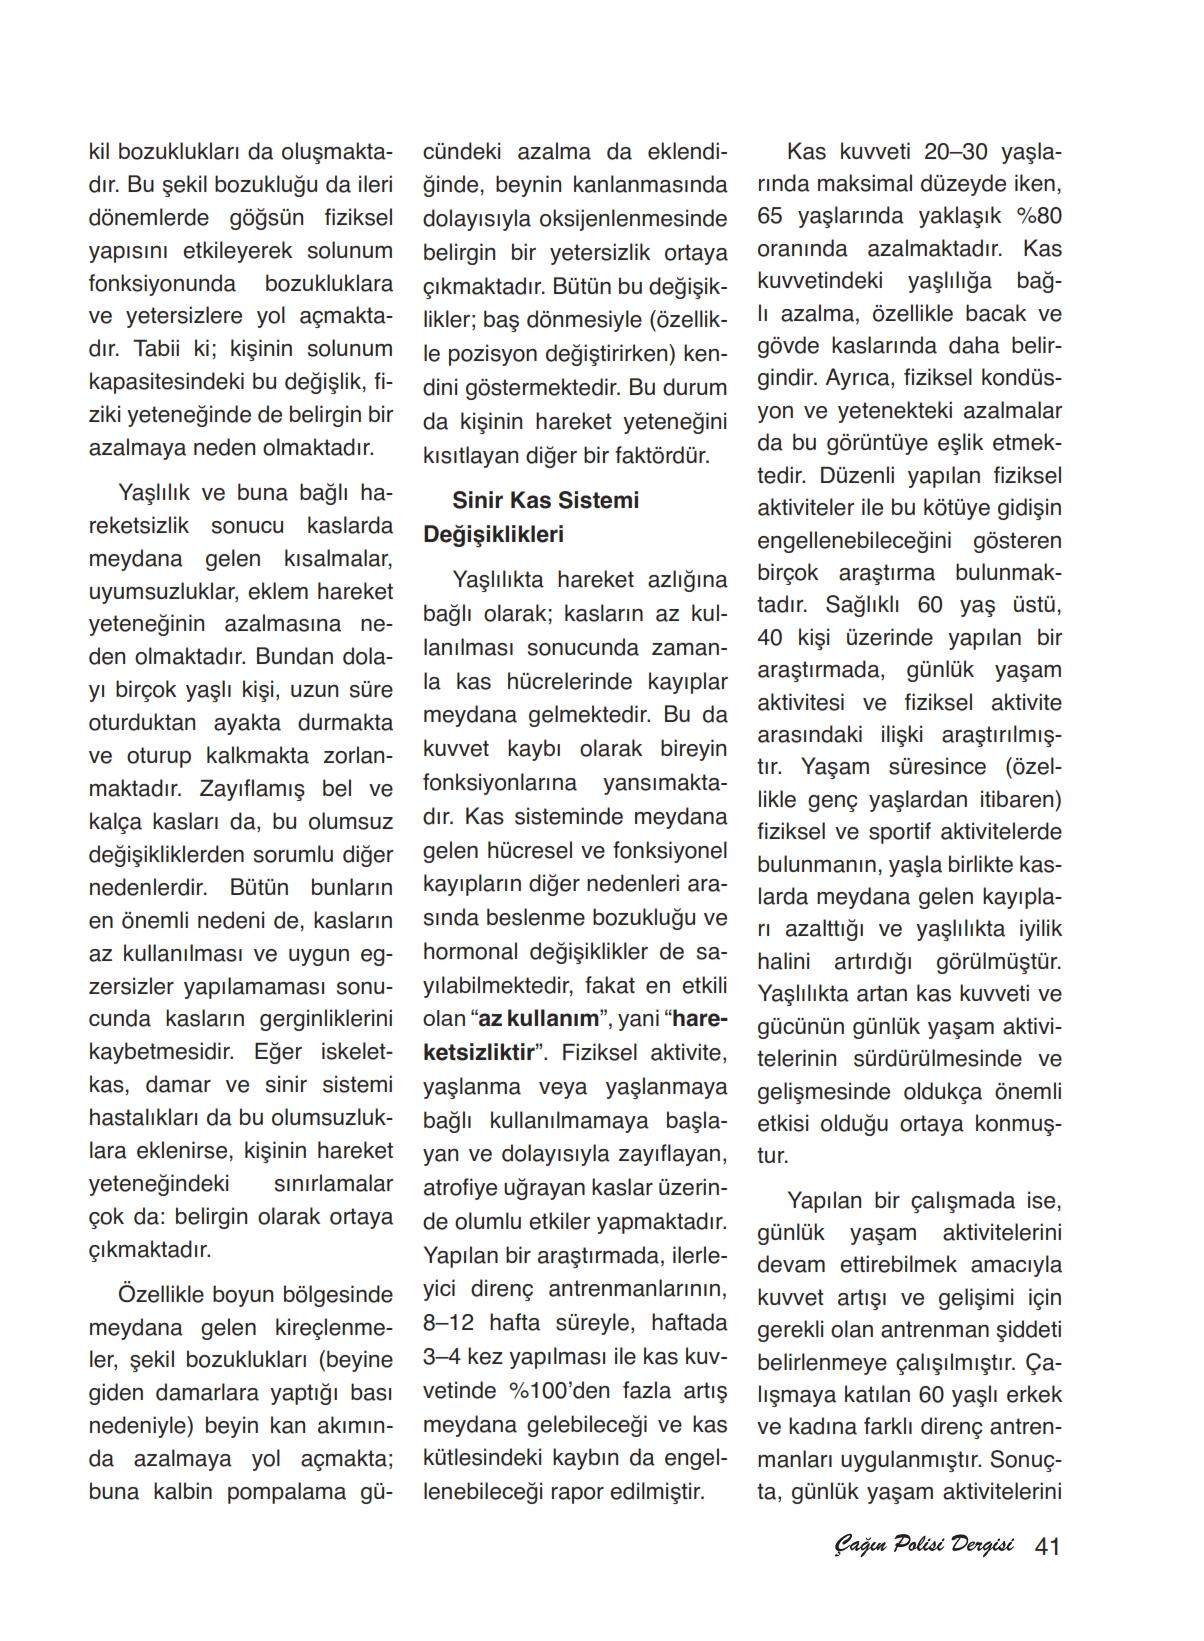 polis_dergi_ekim_2013_baski_043